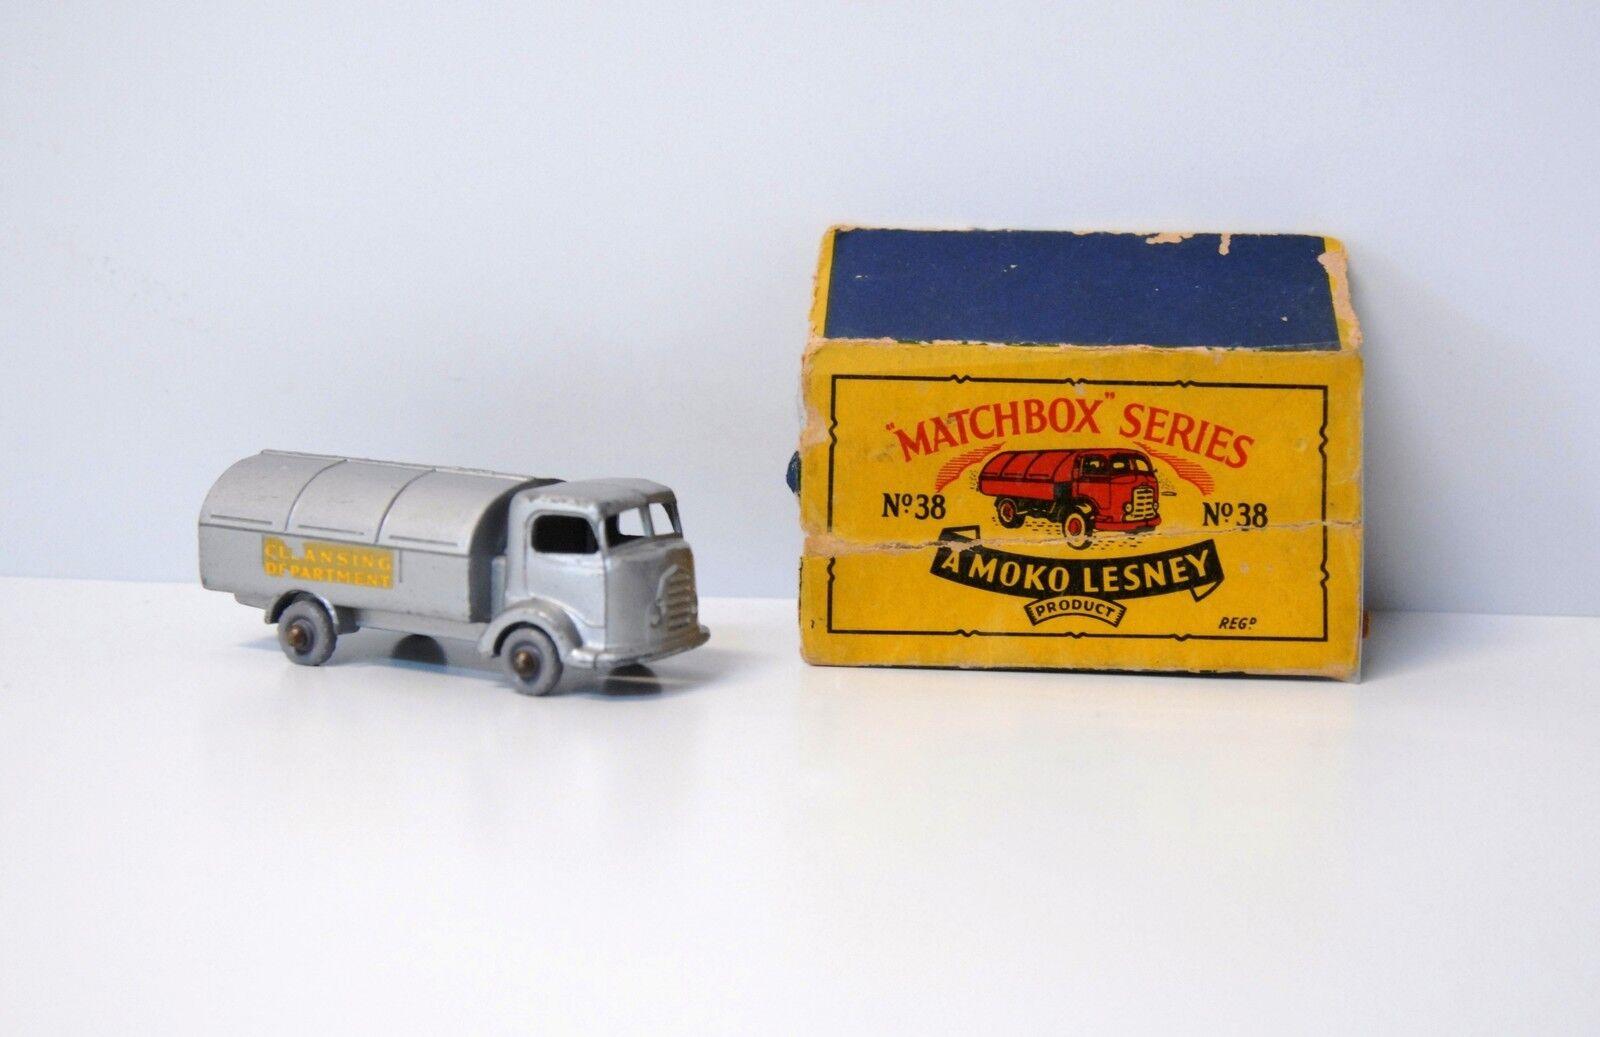 Vintage Matchbox Lesney 38 Plata Caja original un Moko se niegan karrirer damadged